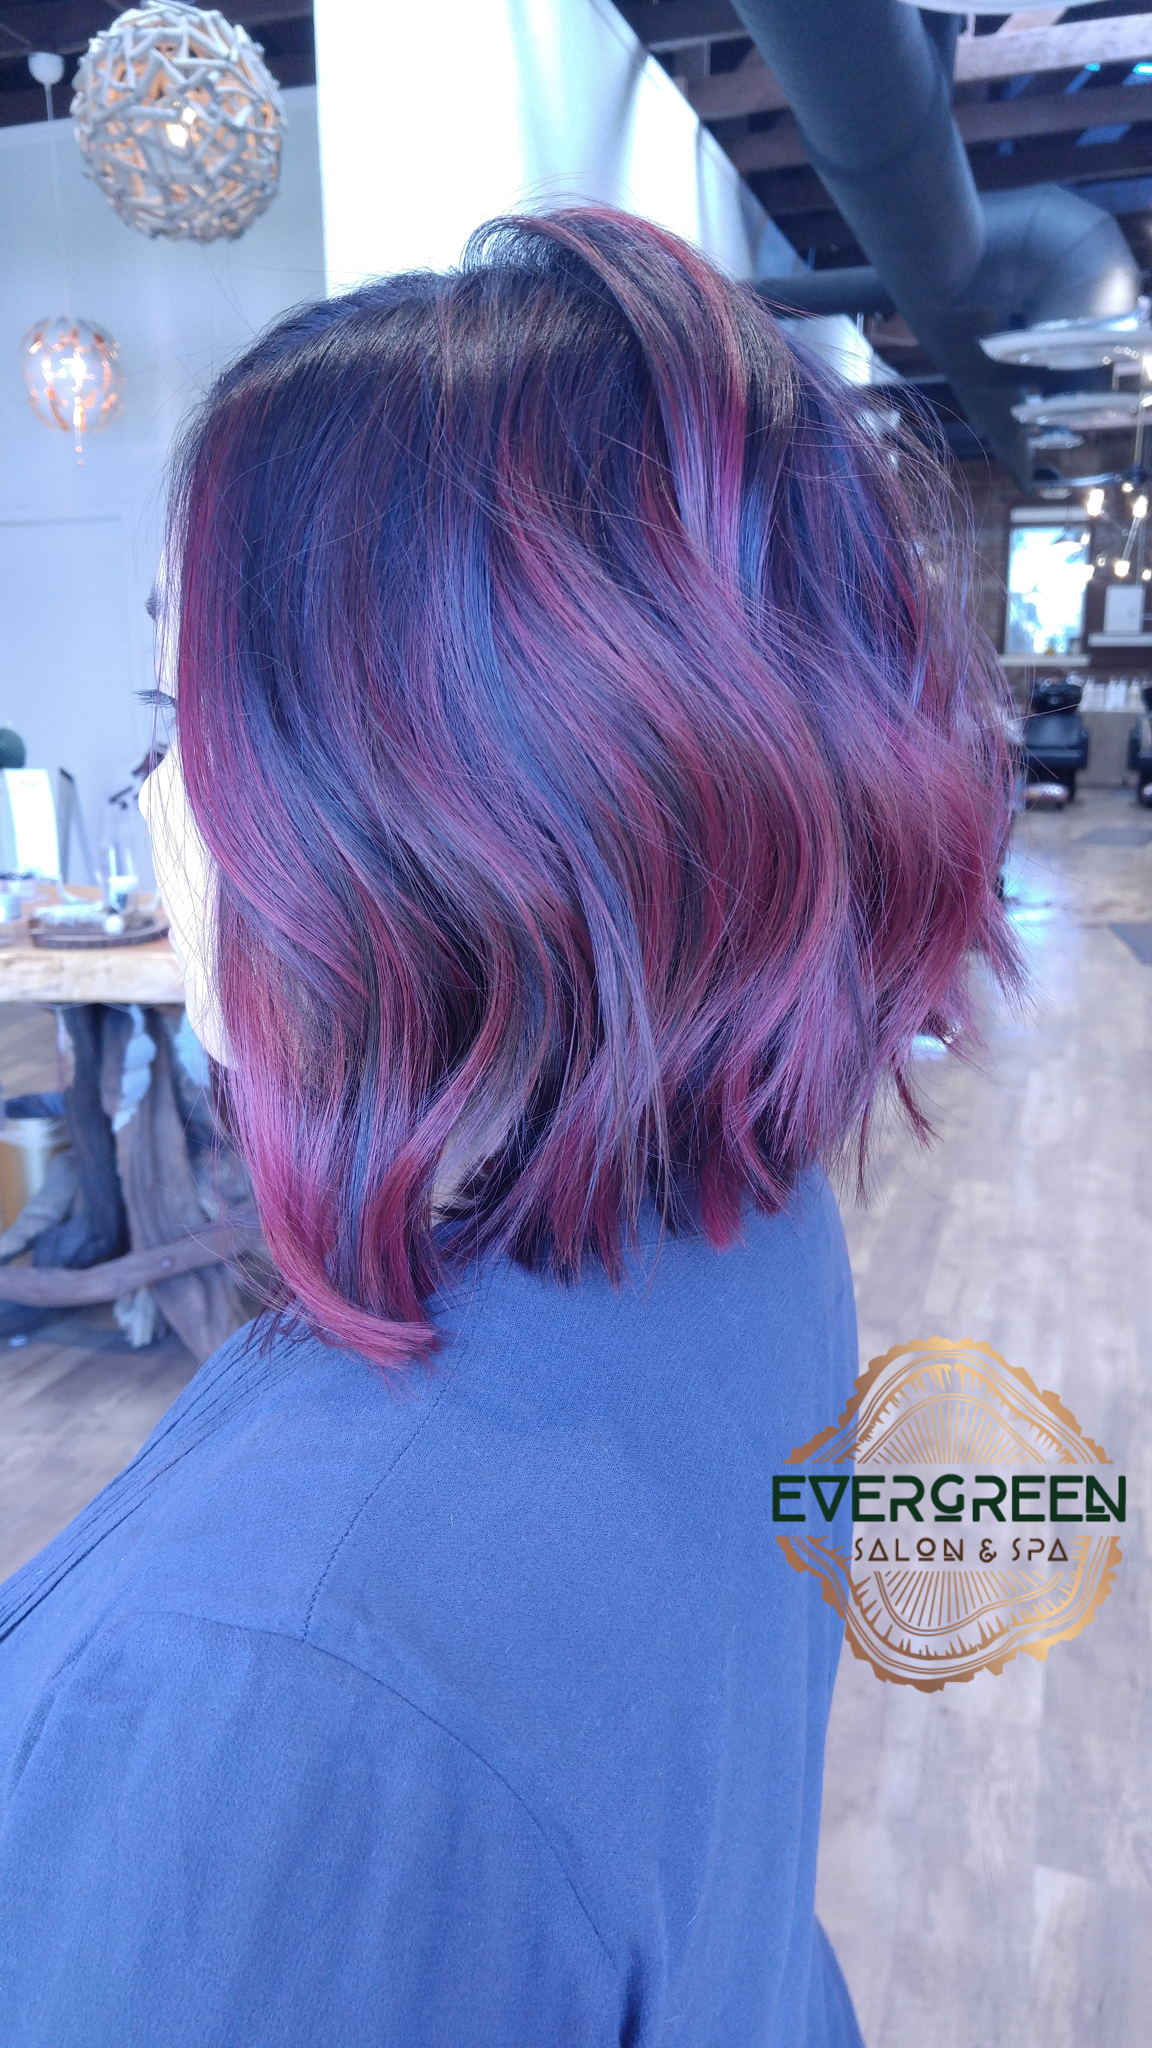 Black Purple Pink Red Blue Color Hair Short Medium Length Hair Wavy Curls Purple Ombre Hair Dyed Hair Purple Short Ombre Hair